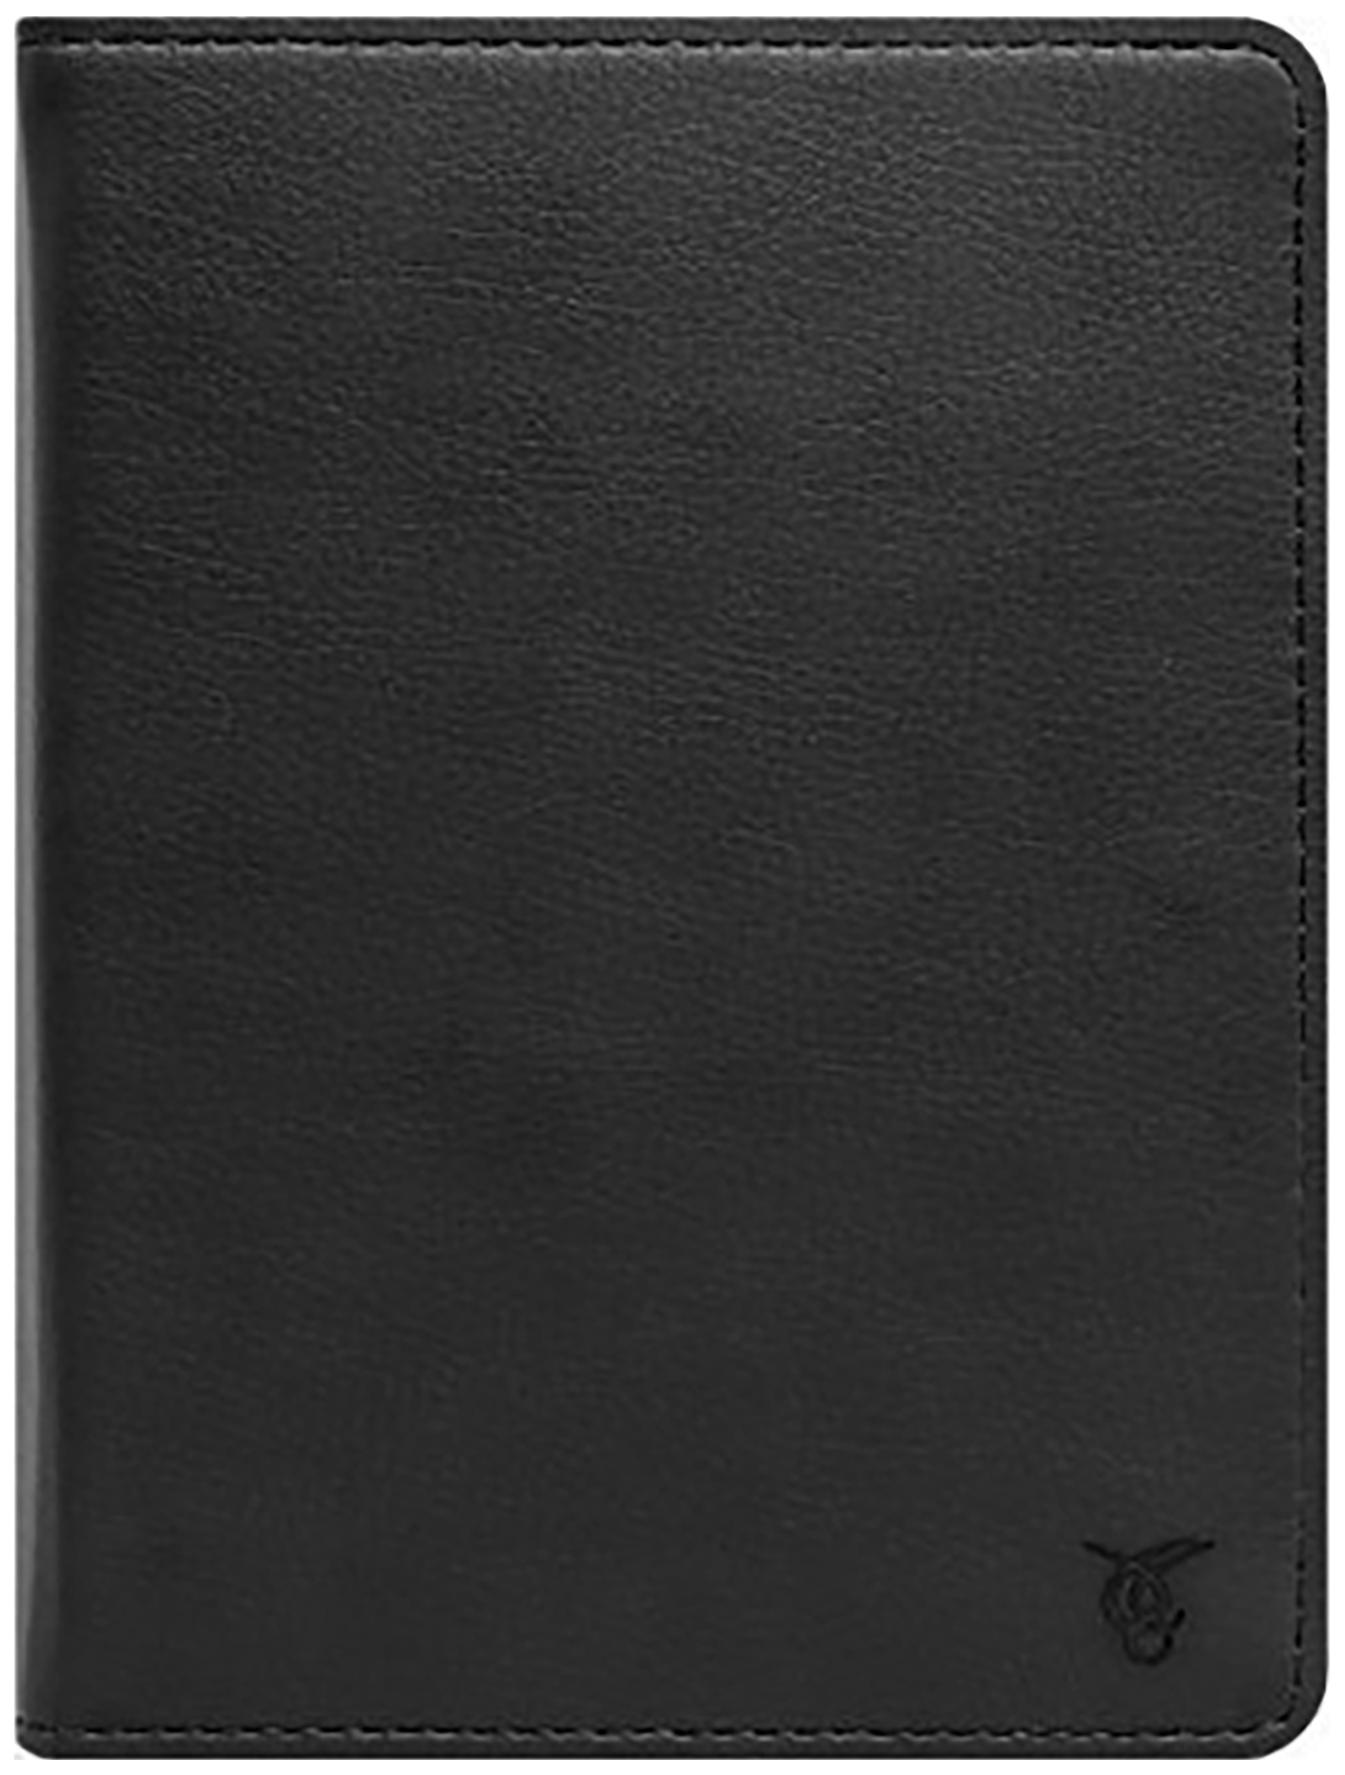 Чехол для электронной книги Vivacase Basic PocketBook 840 Black Basic 840